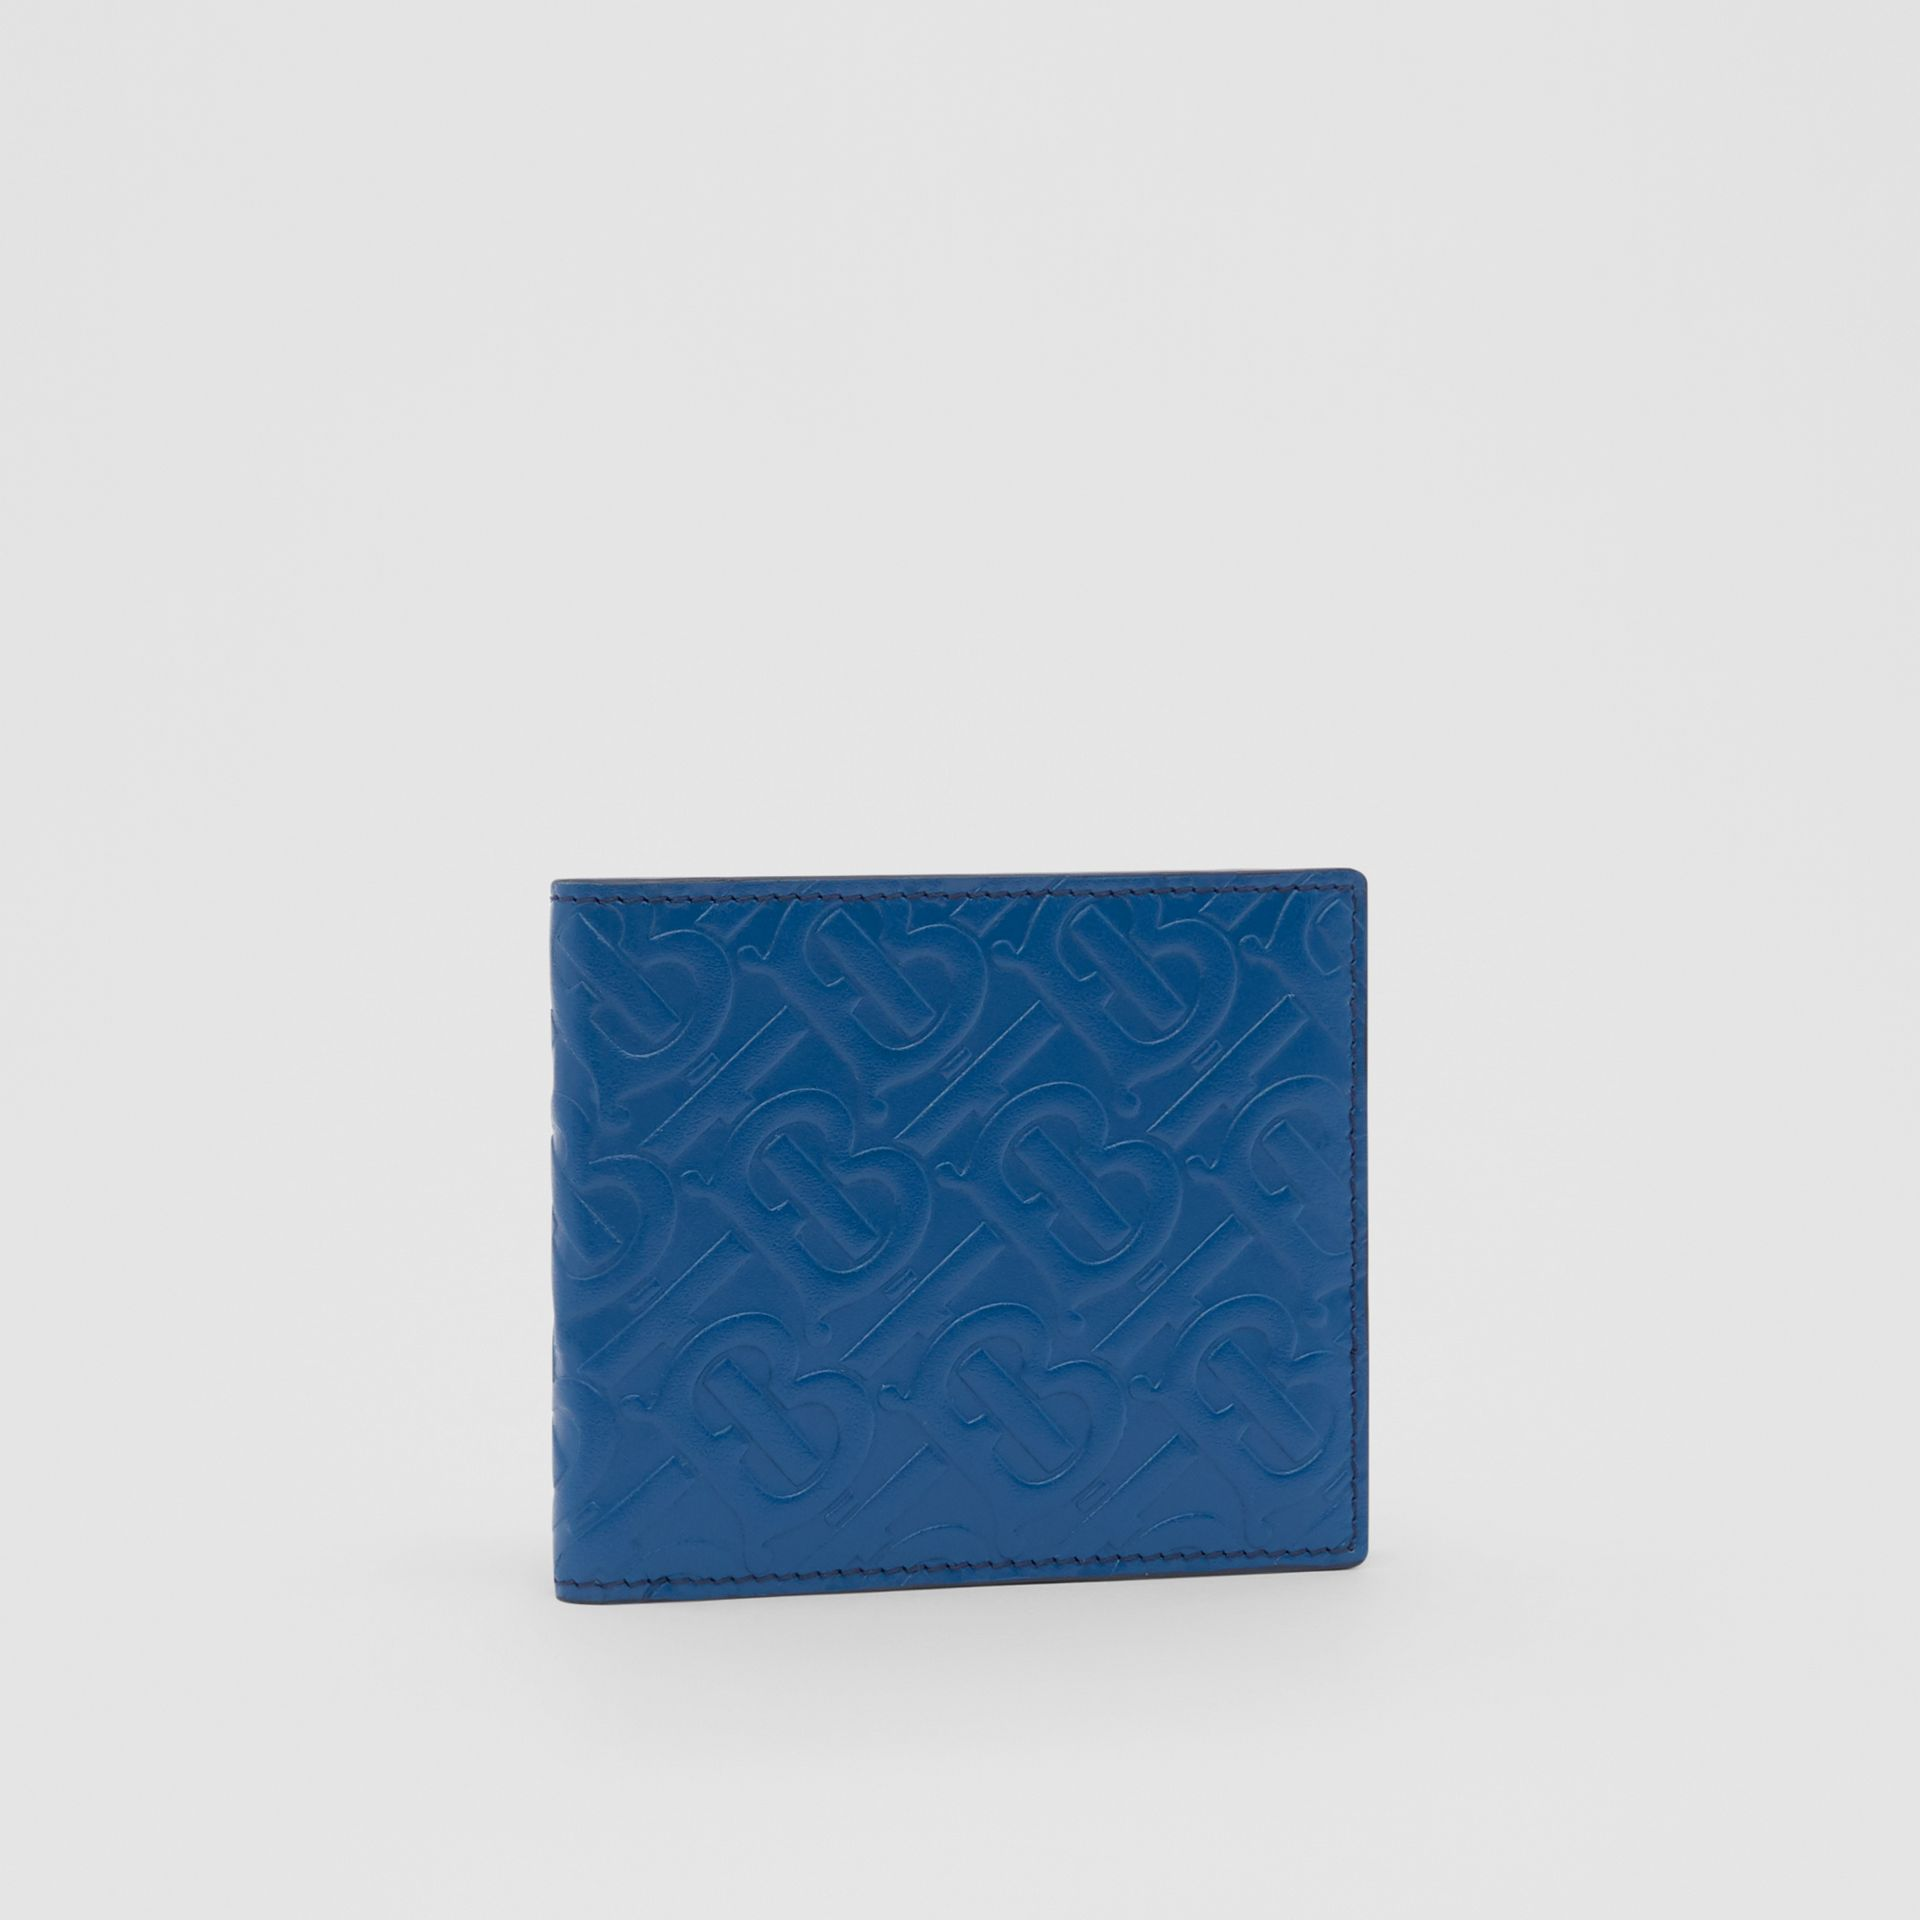 Monogram Leather International Bifold Wallet in Pale Canvas Blue - Men   Burberry - gallery image 3